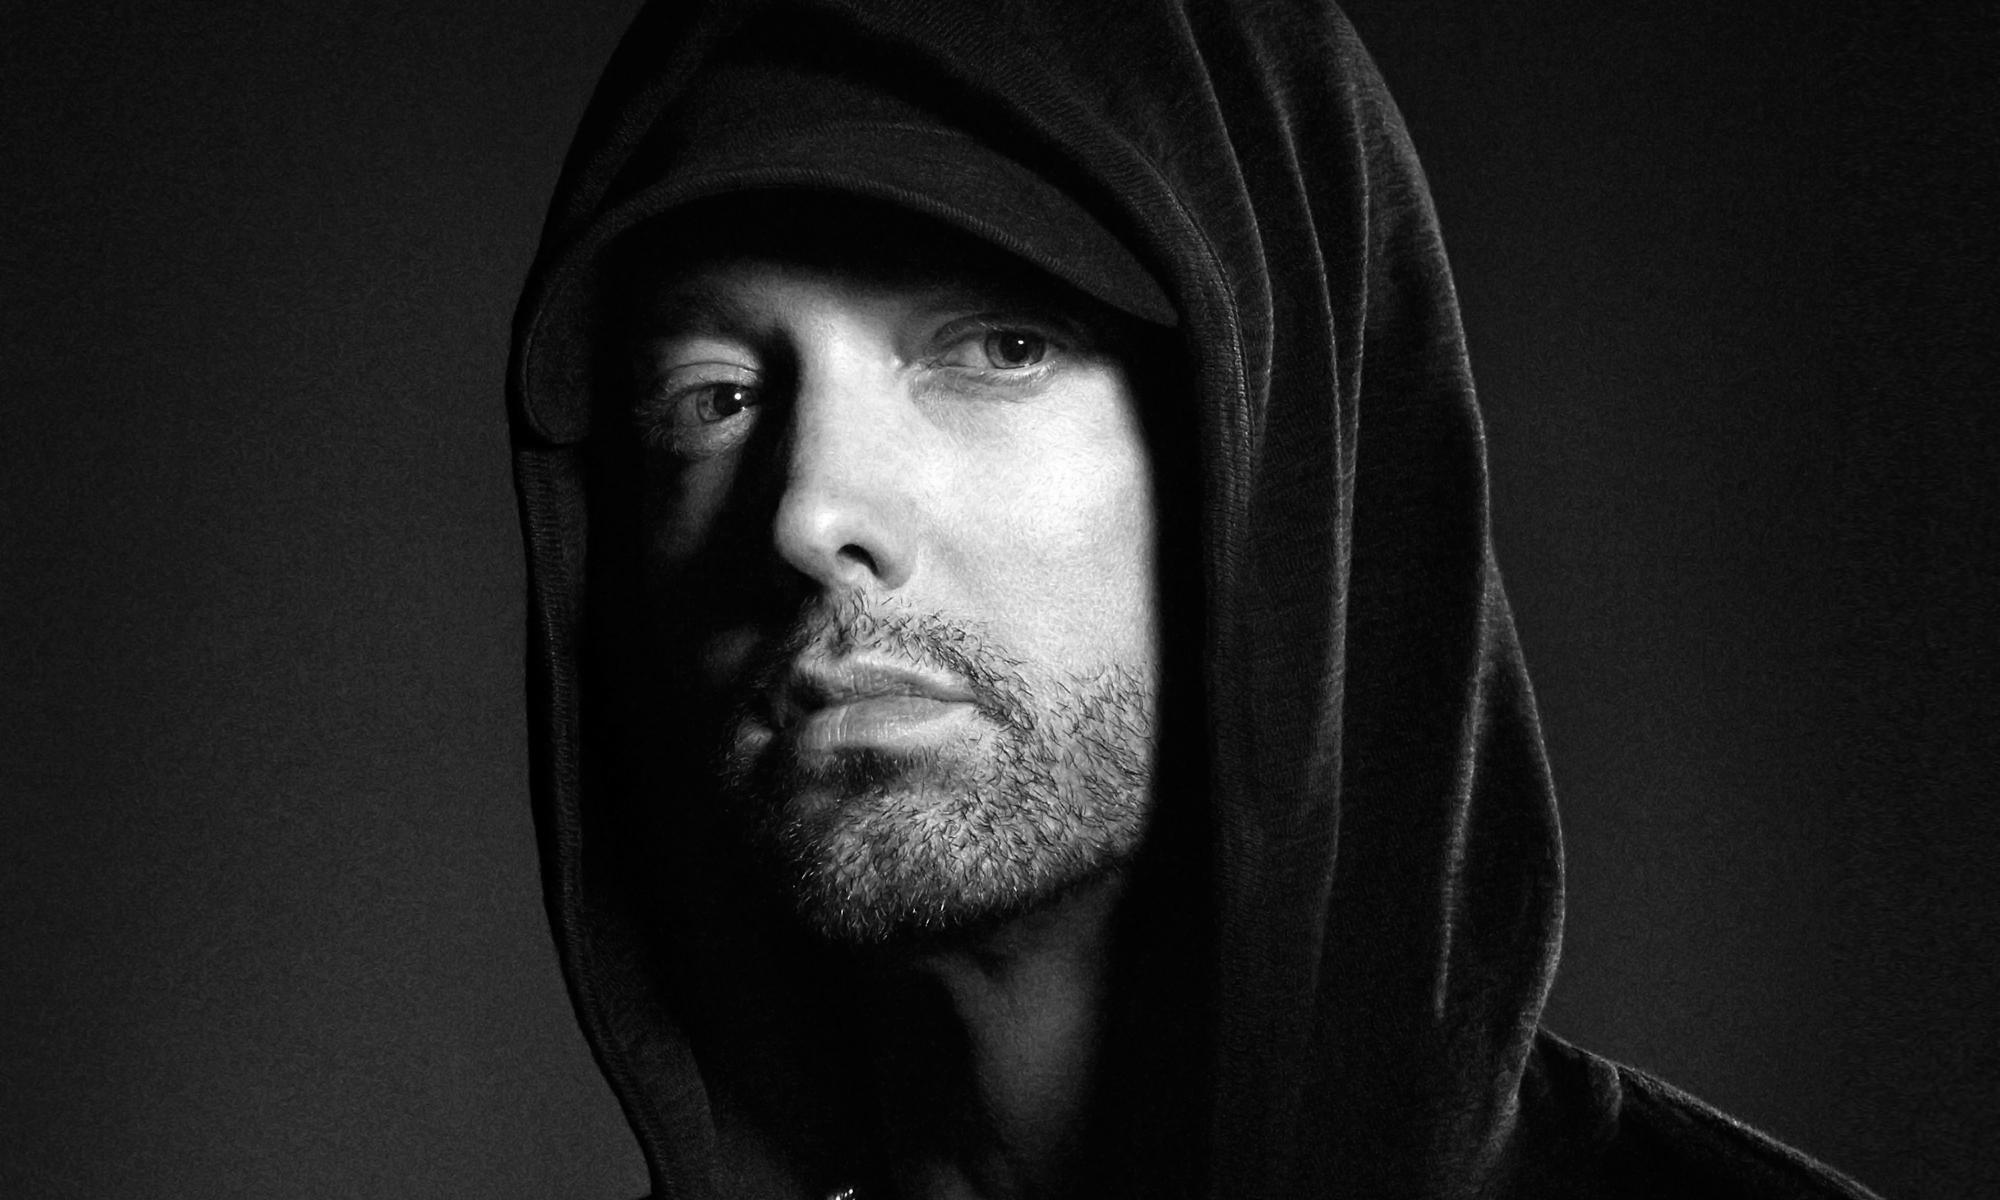 Eminem 公布其心目中最强 rapper 名单